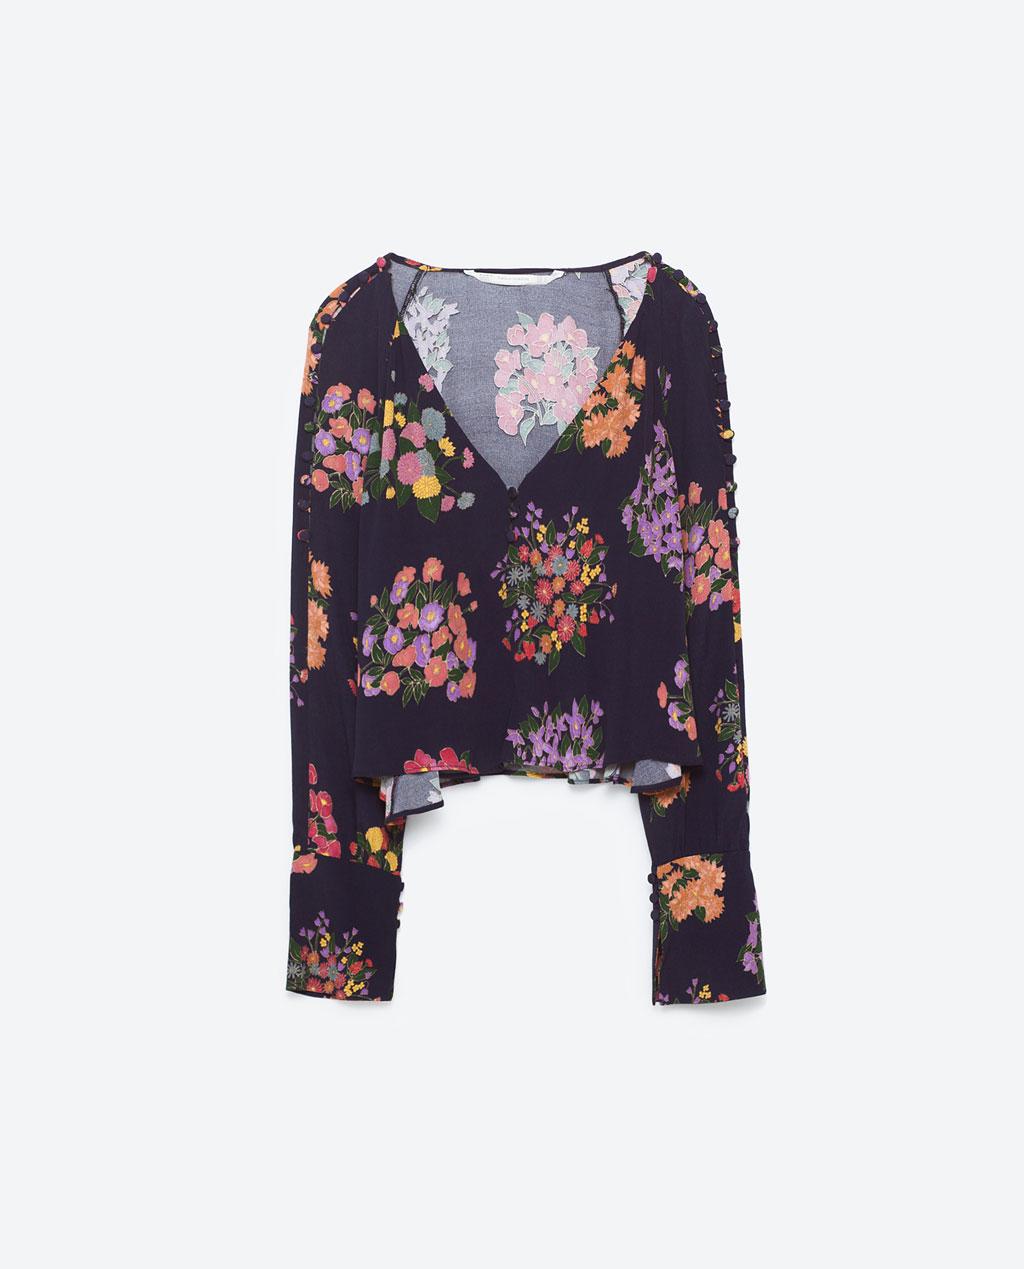 Zara floral top from zara.com.